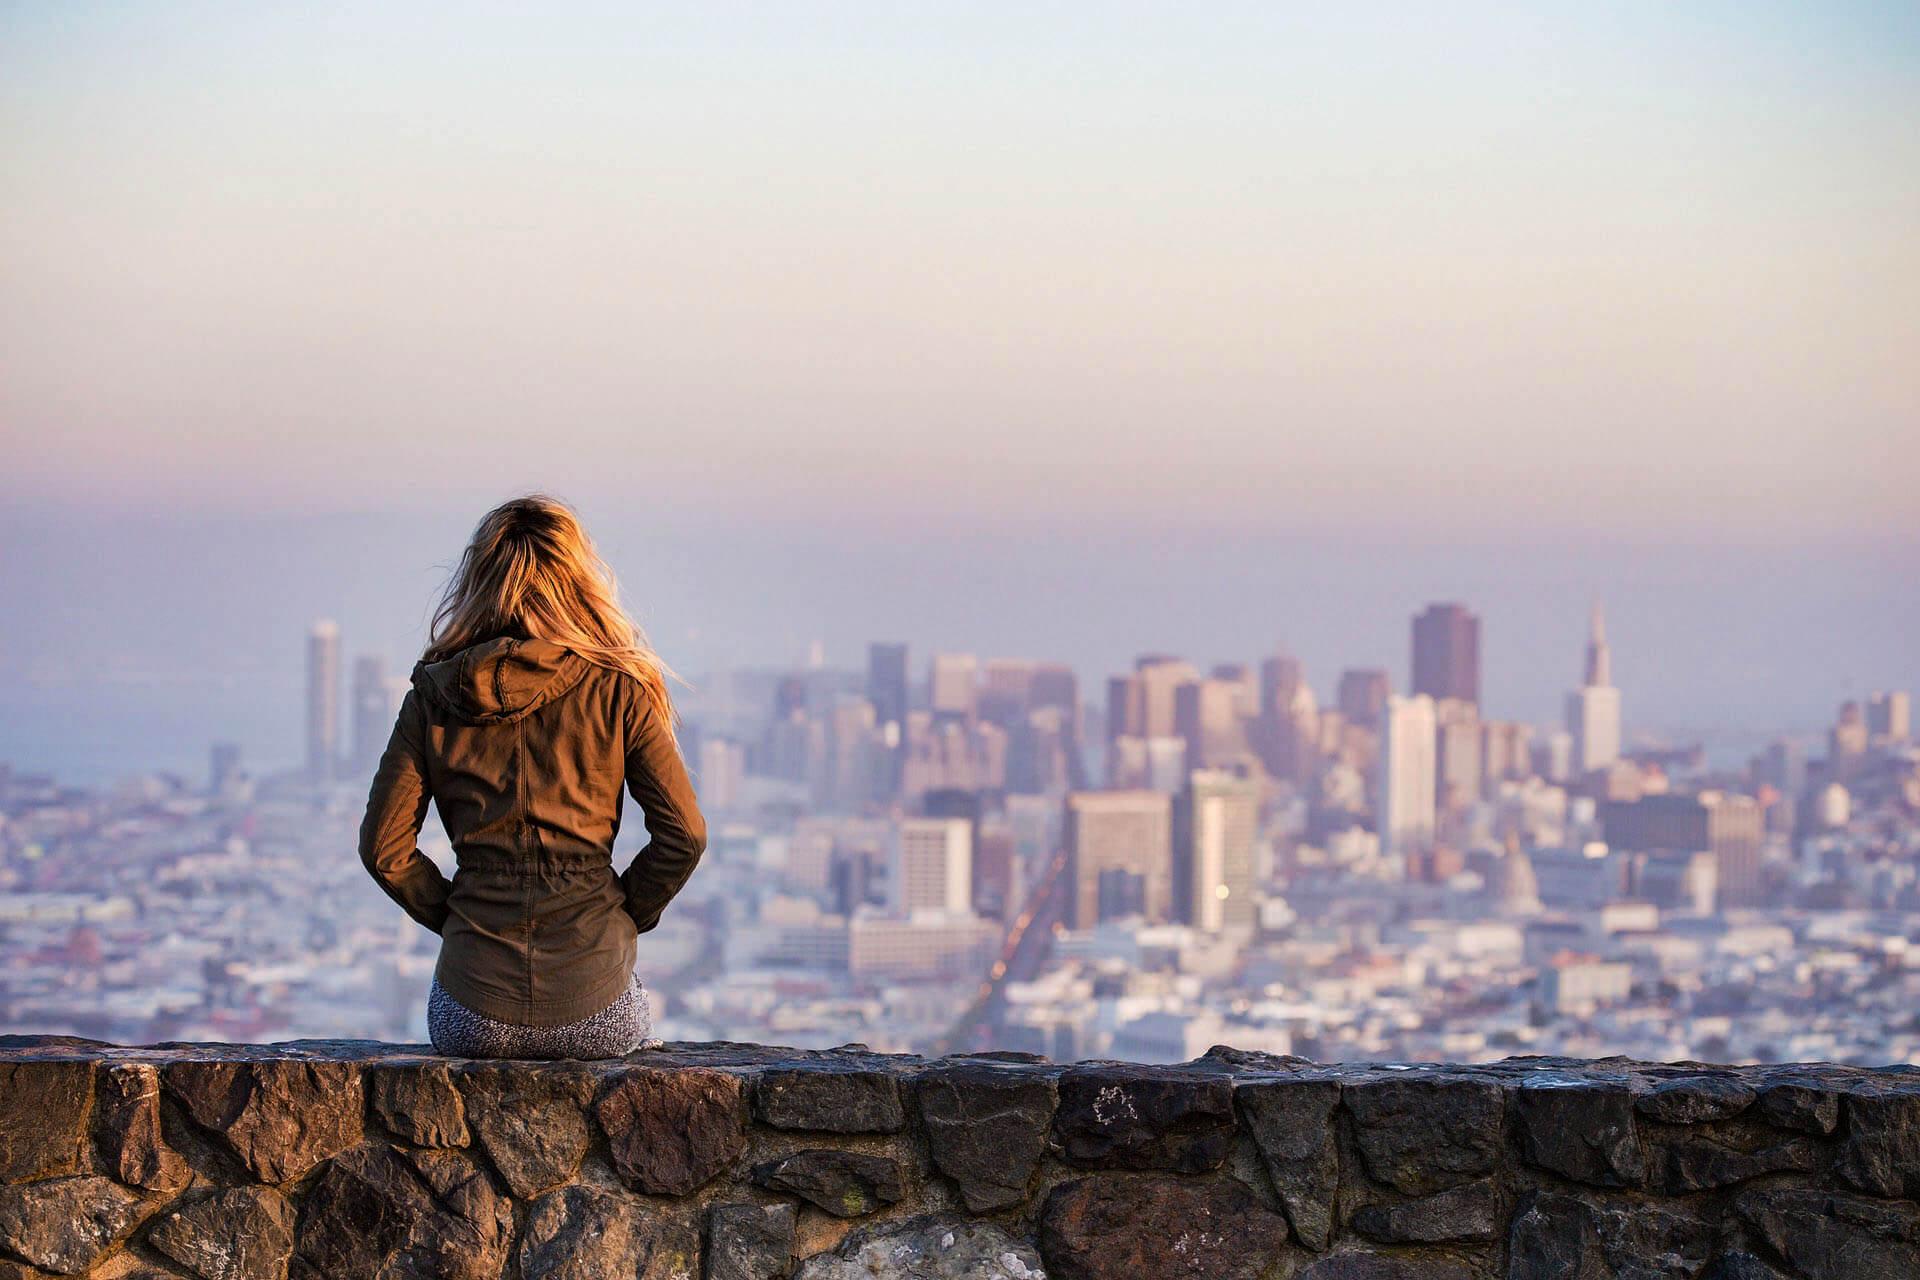 TravSolo - Woman Traveling alone